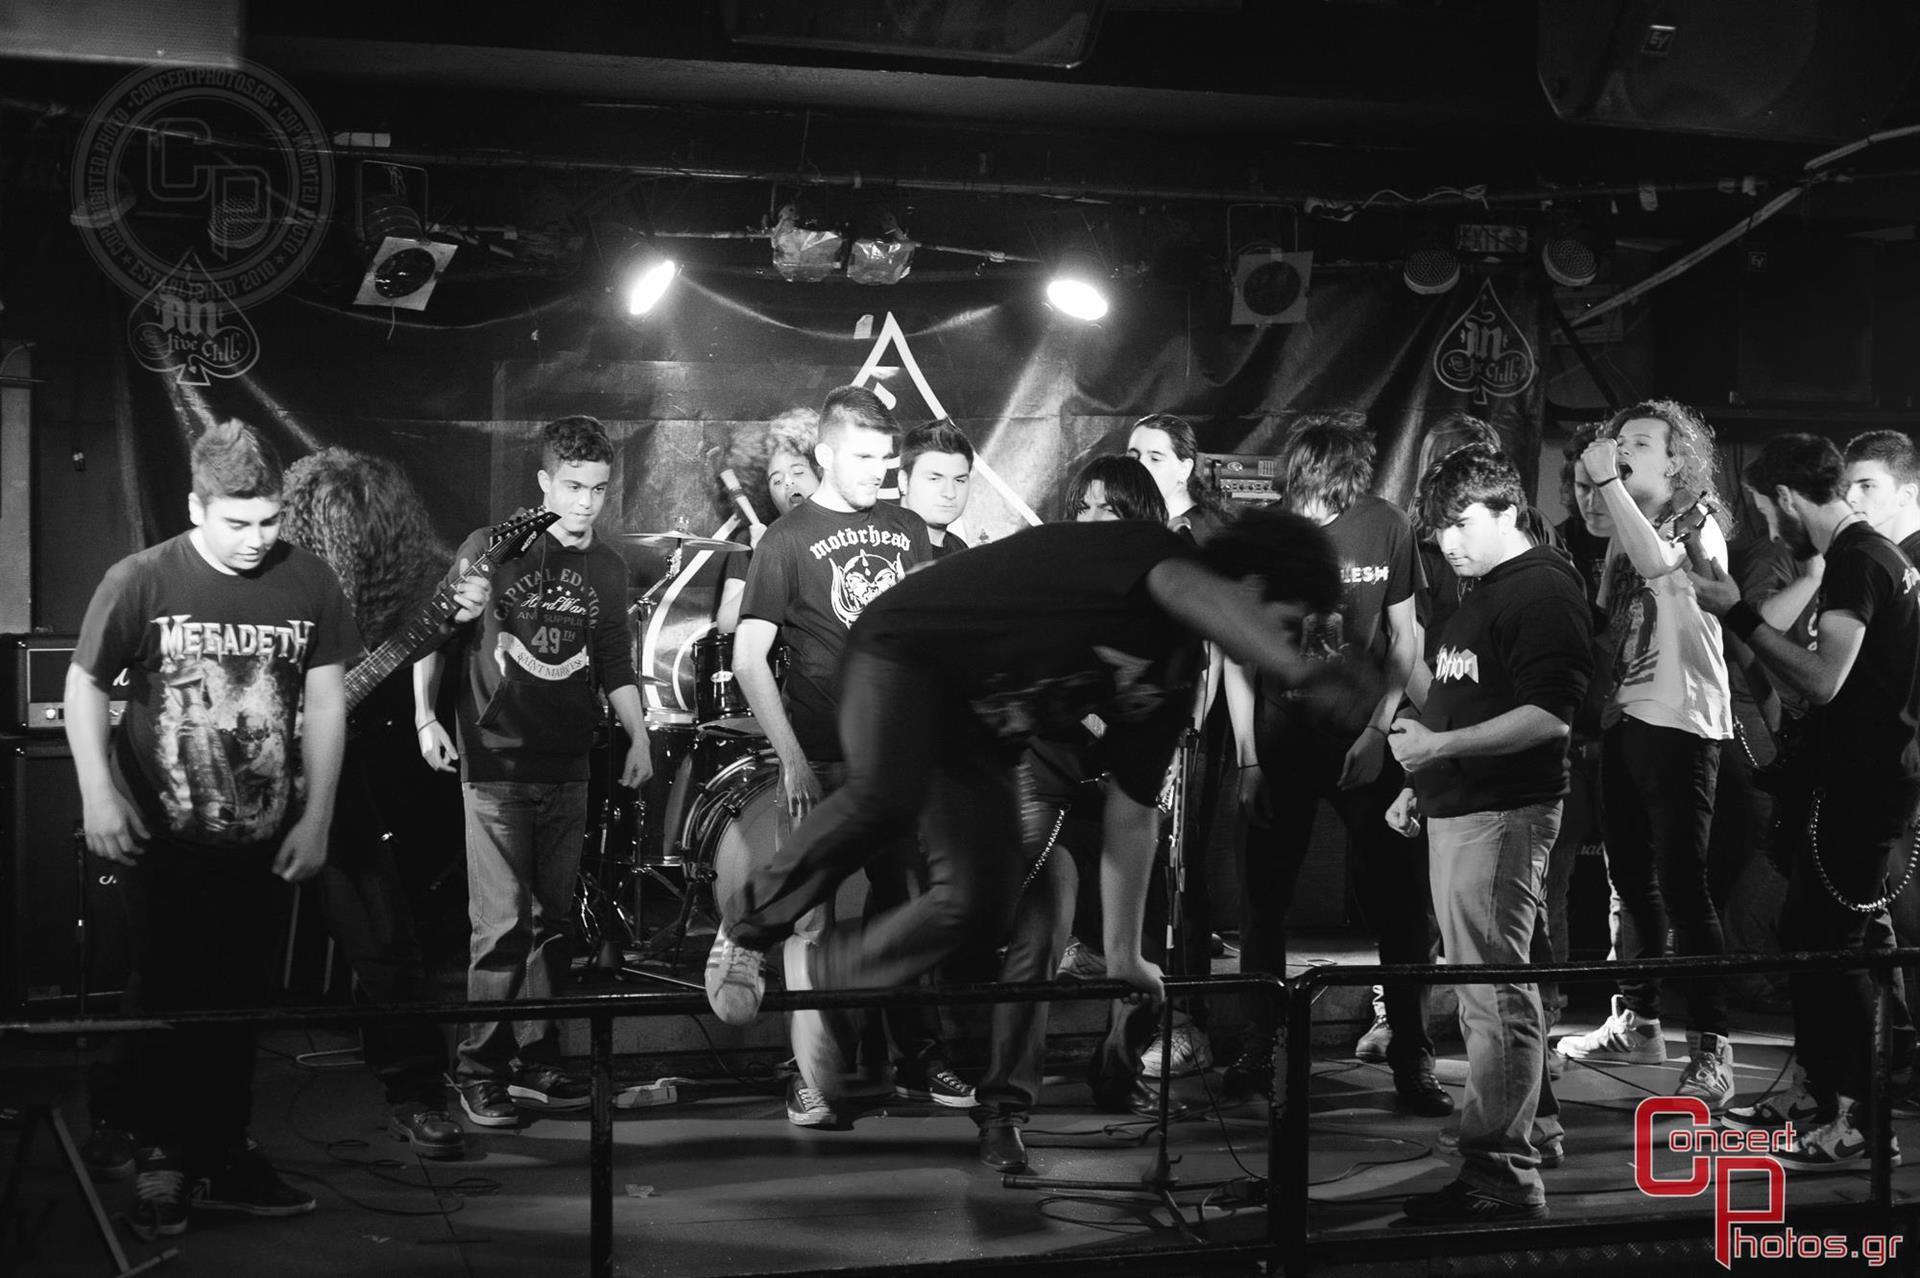 Battle Of The Bands Athens - Leg 3- photographer:  - ConcertPhotos - 20150104_2335_27